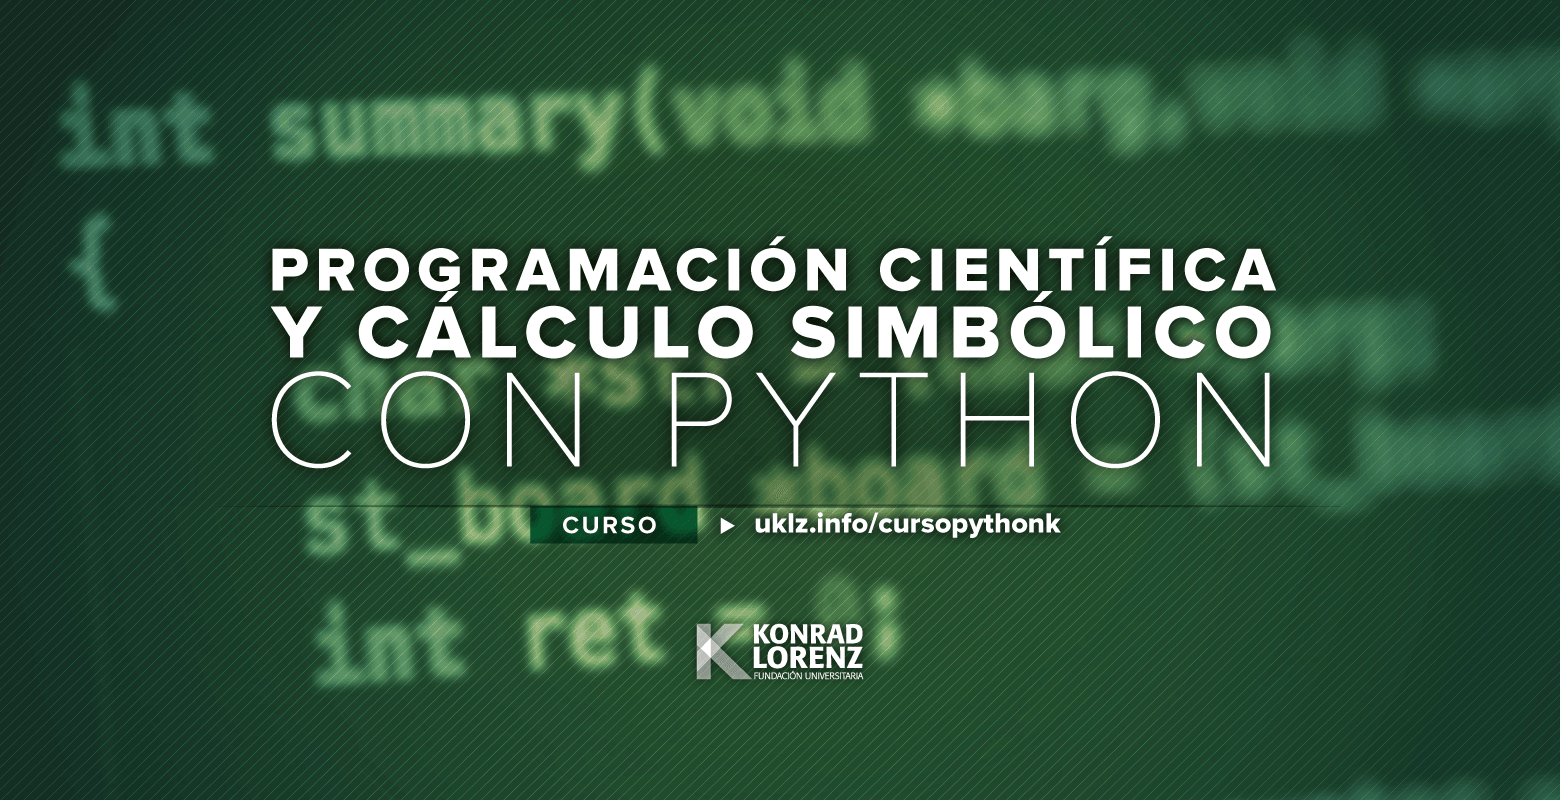 Curso de Programación Científica y Cálculo Simbólico con Python